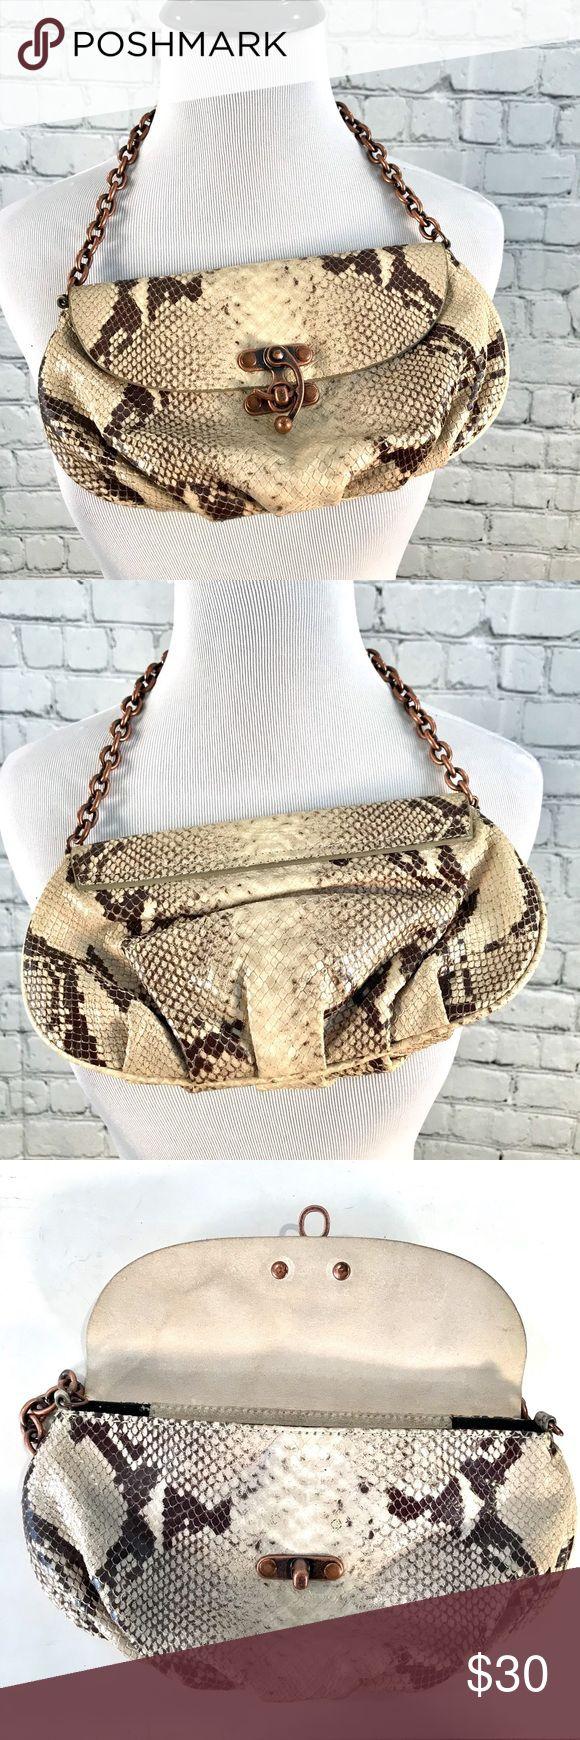 Cynthia Rowley animal print purse Excellent condition Cynthia Rowley Bags